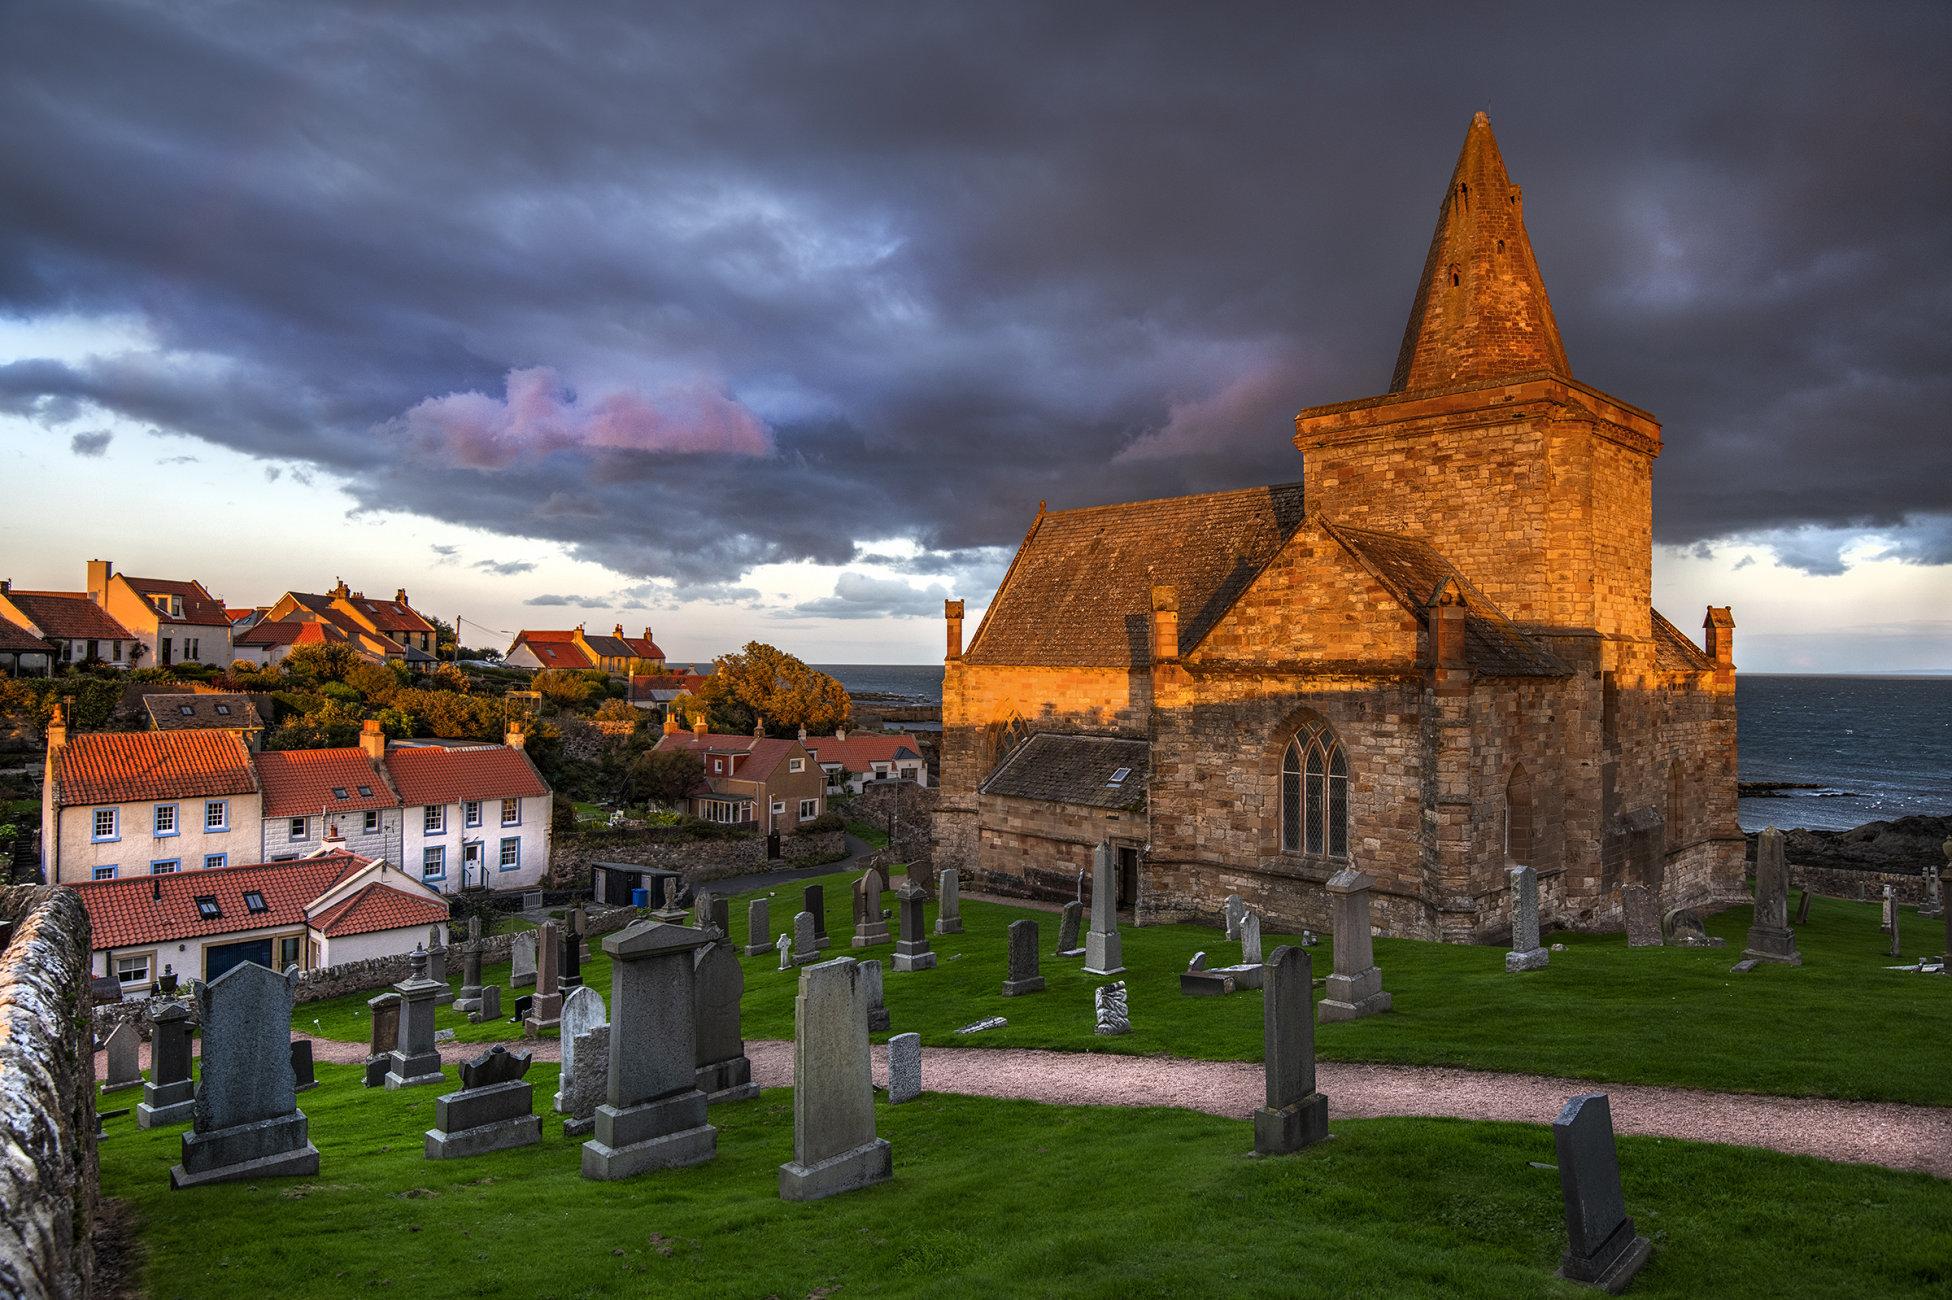 St Monans Parish Church